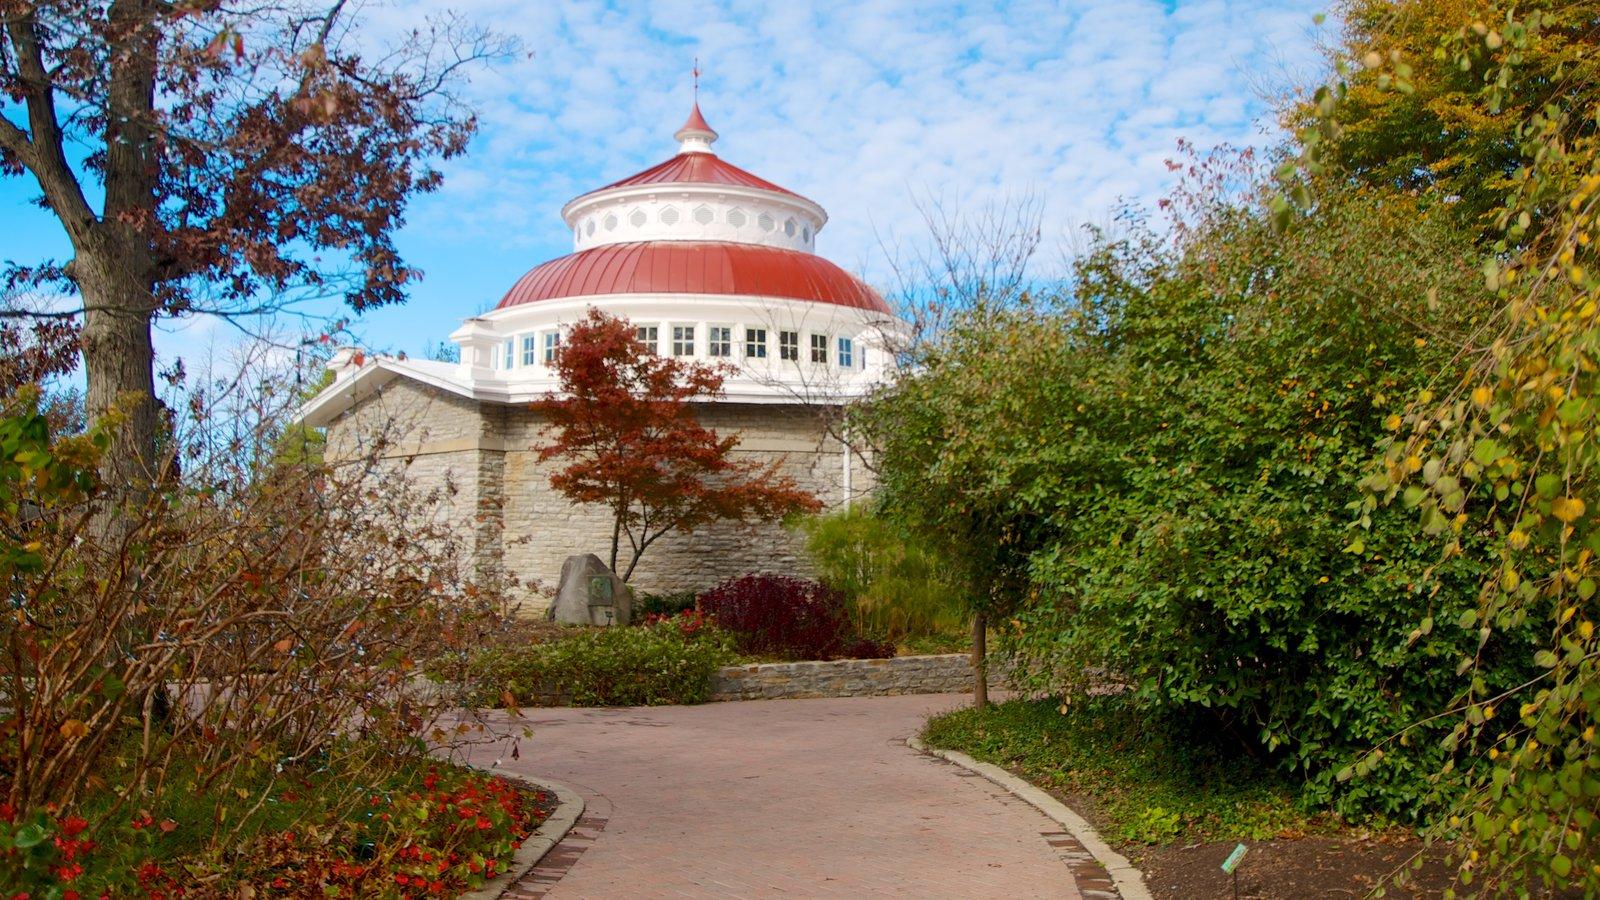 Cincinnati Zoo And Botanical Garden Featuring A Park